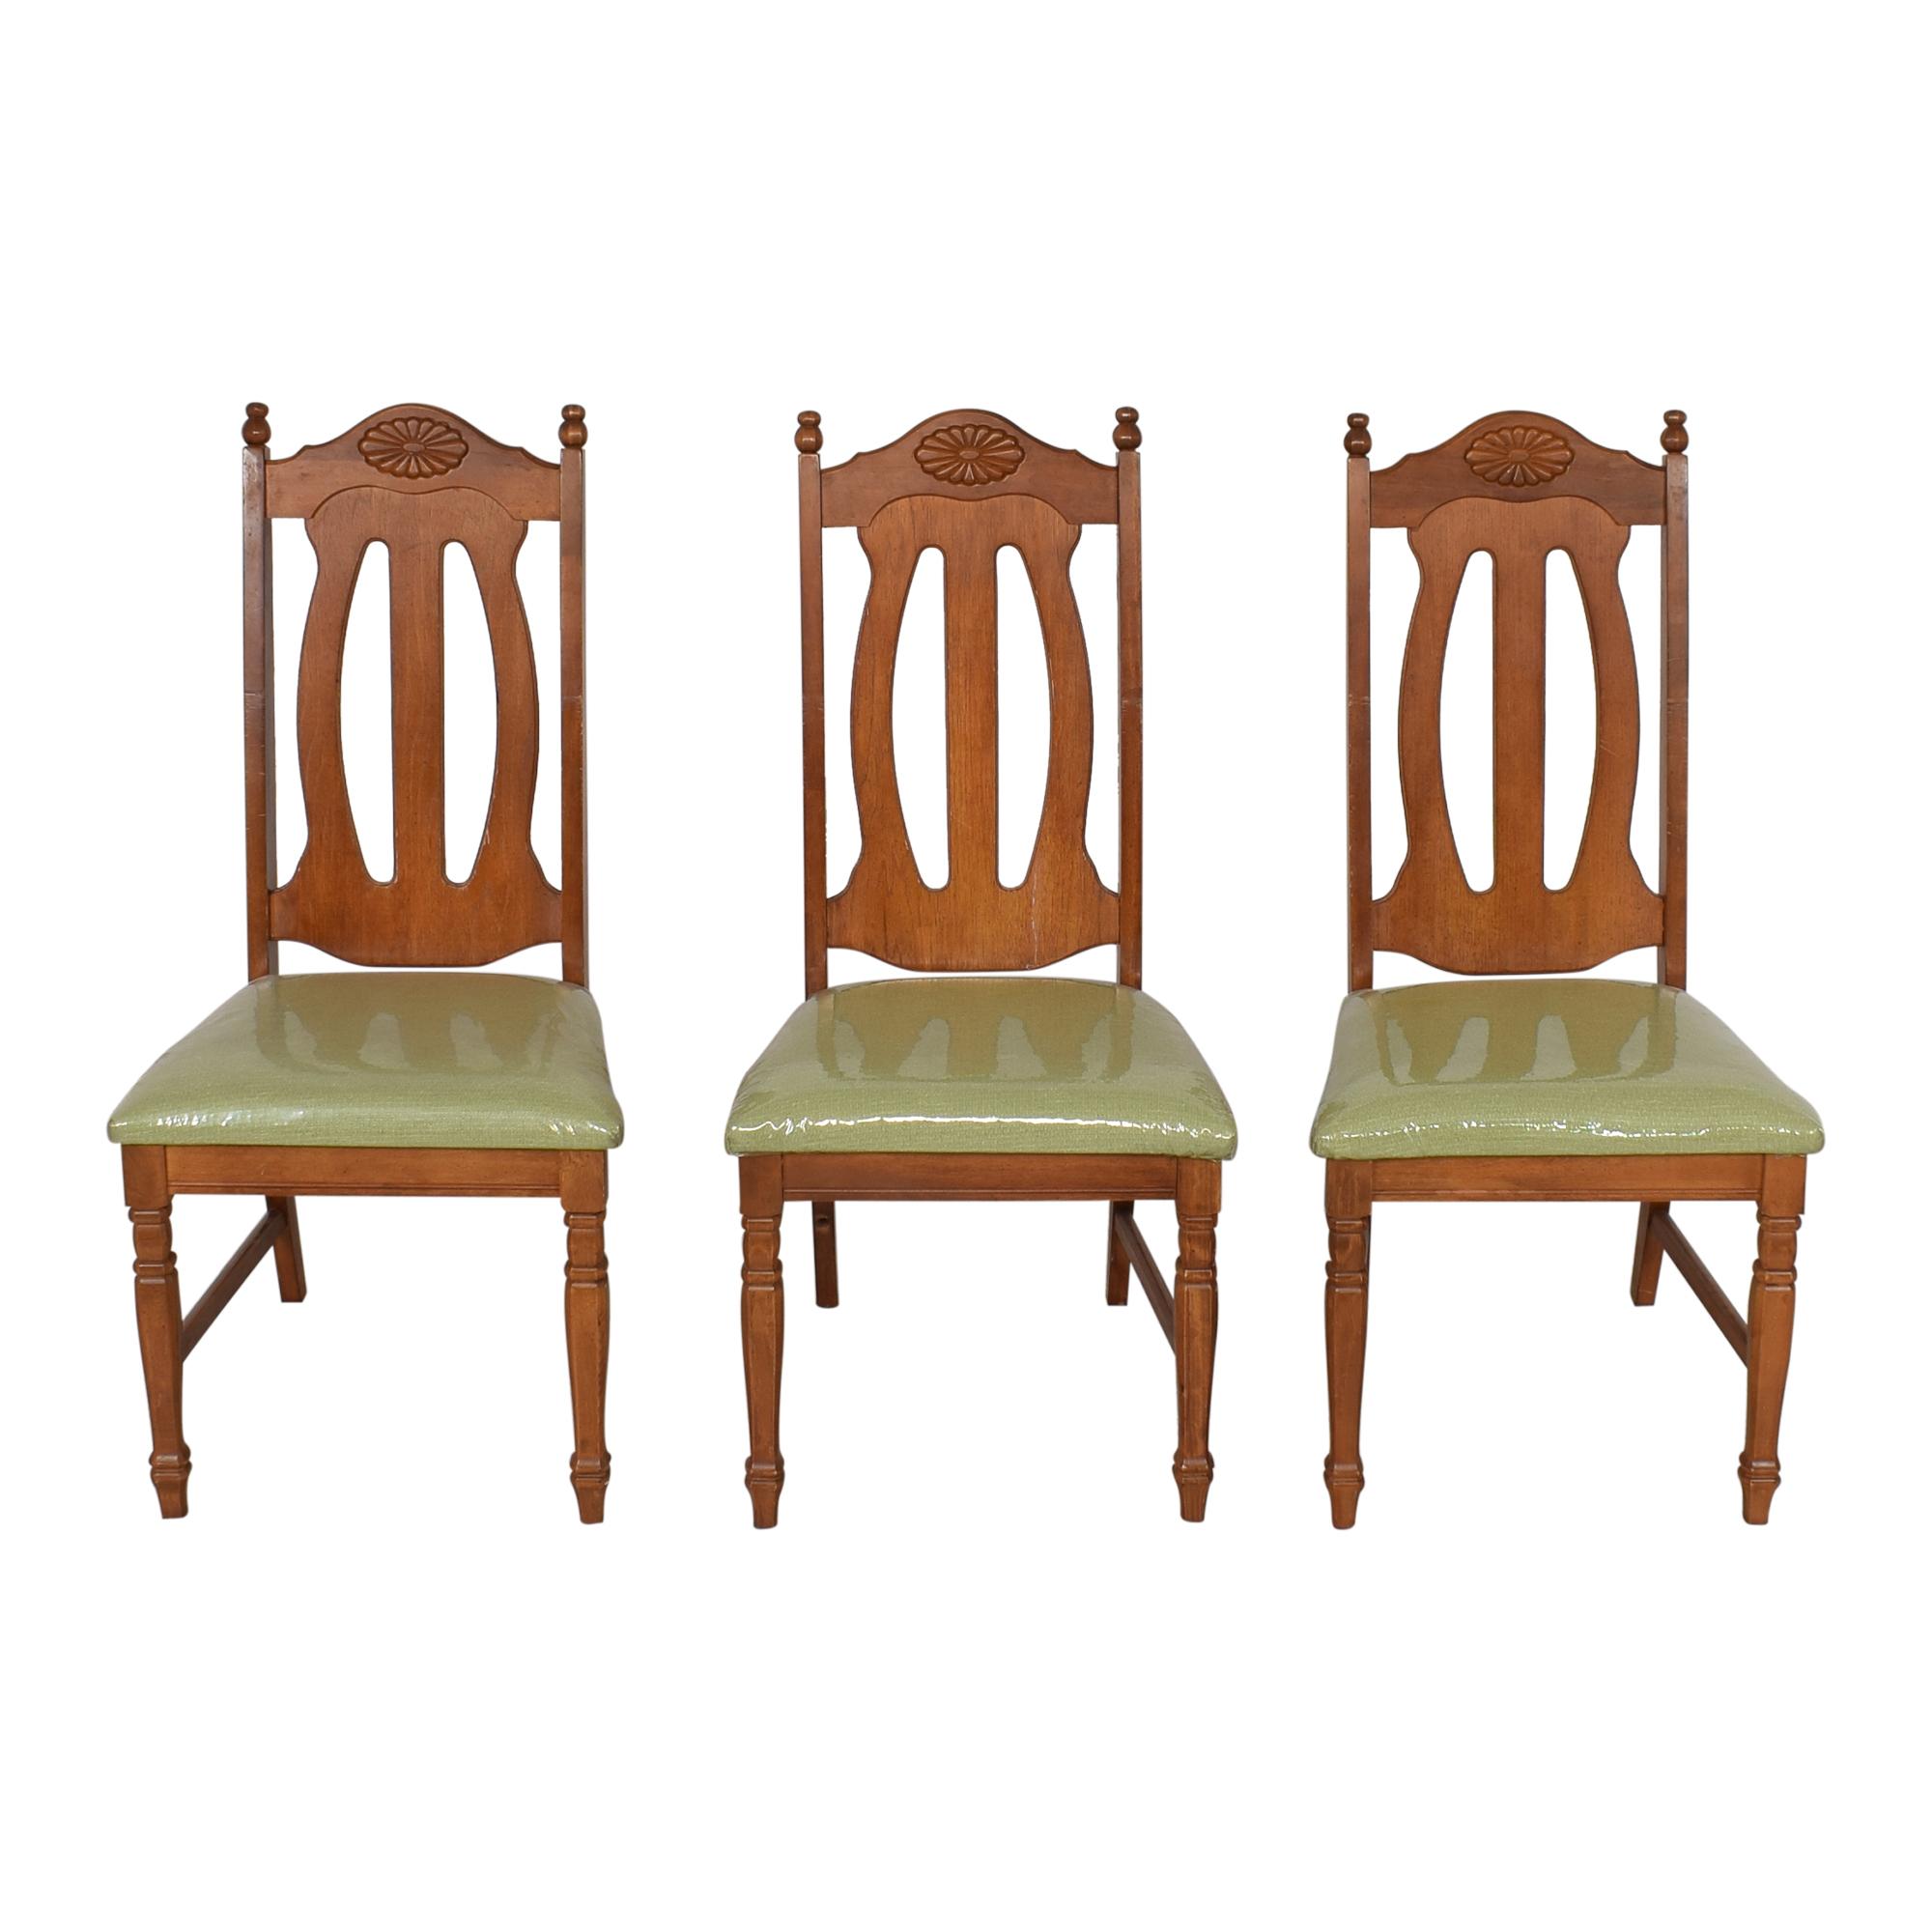 Bassett Furniture Bassett Furniture Vintage Dining Chairs pa